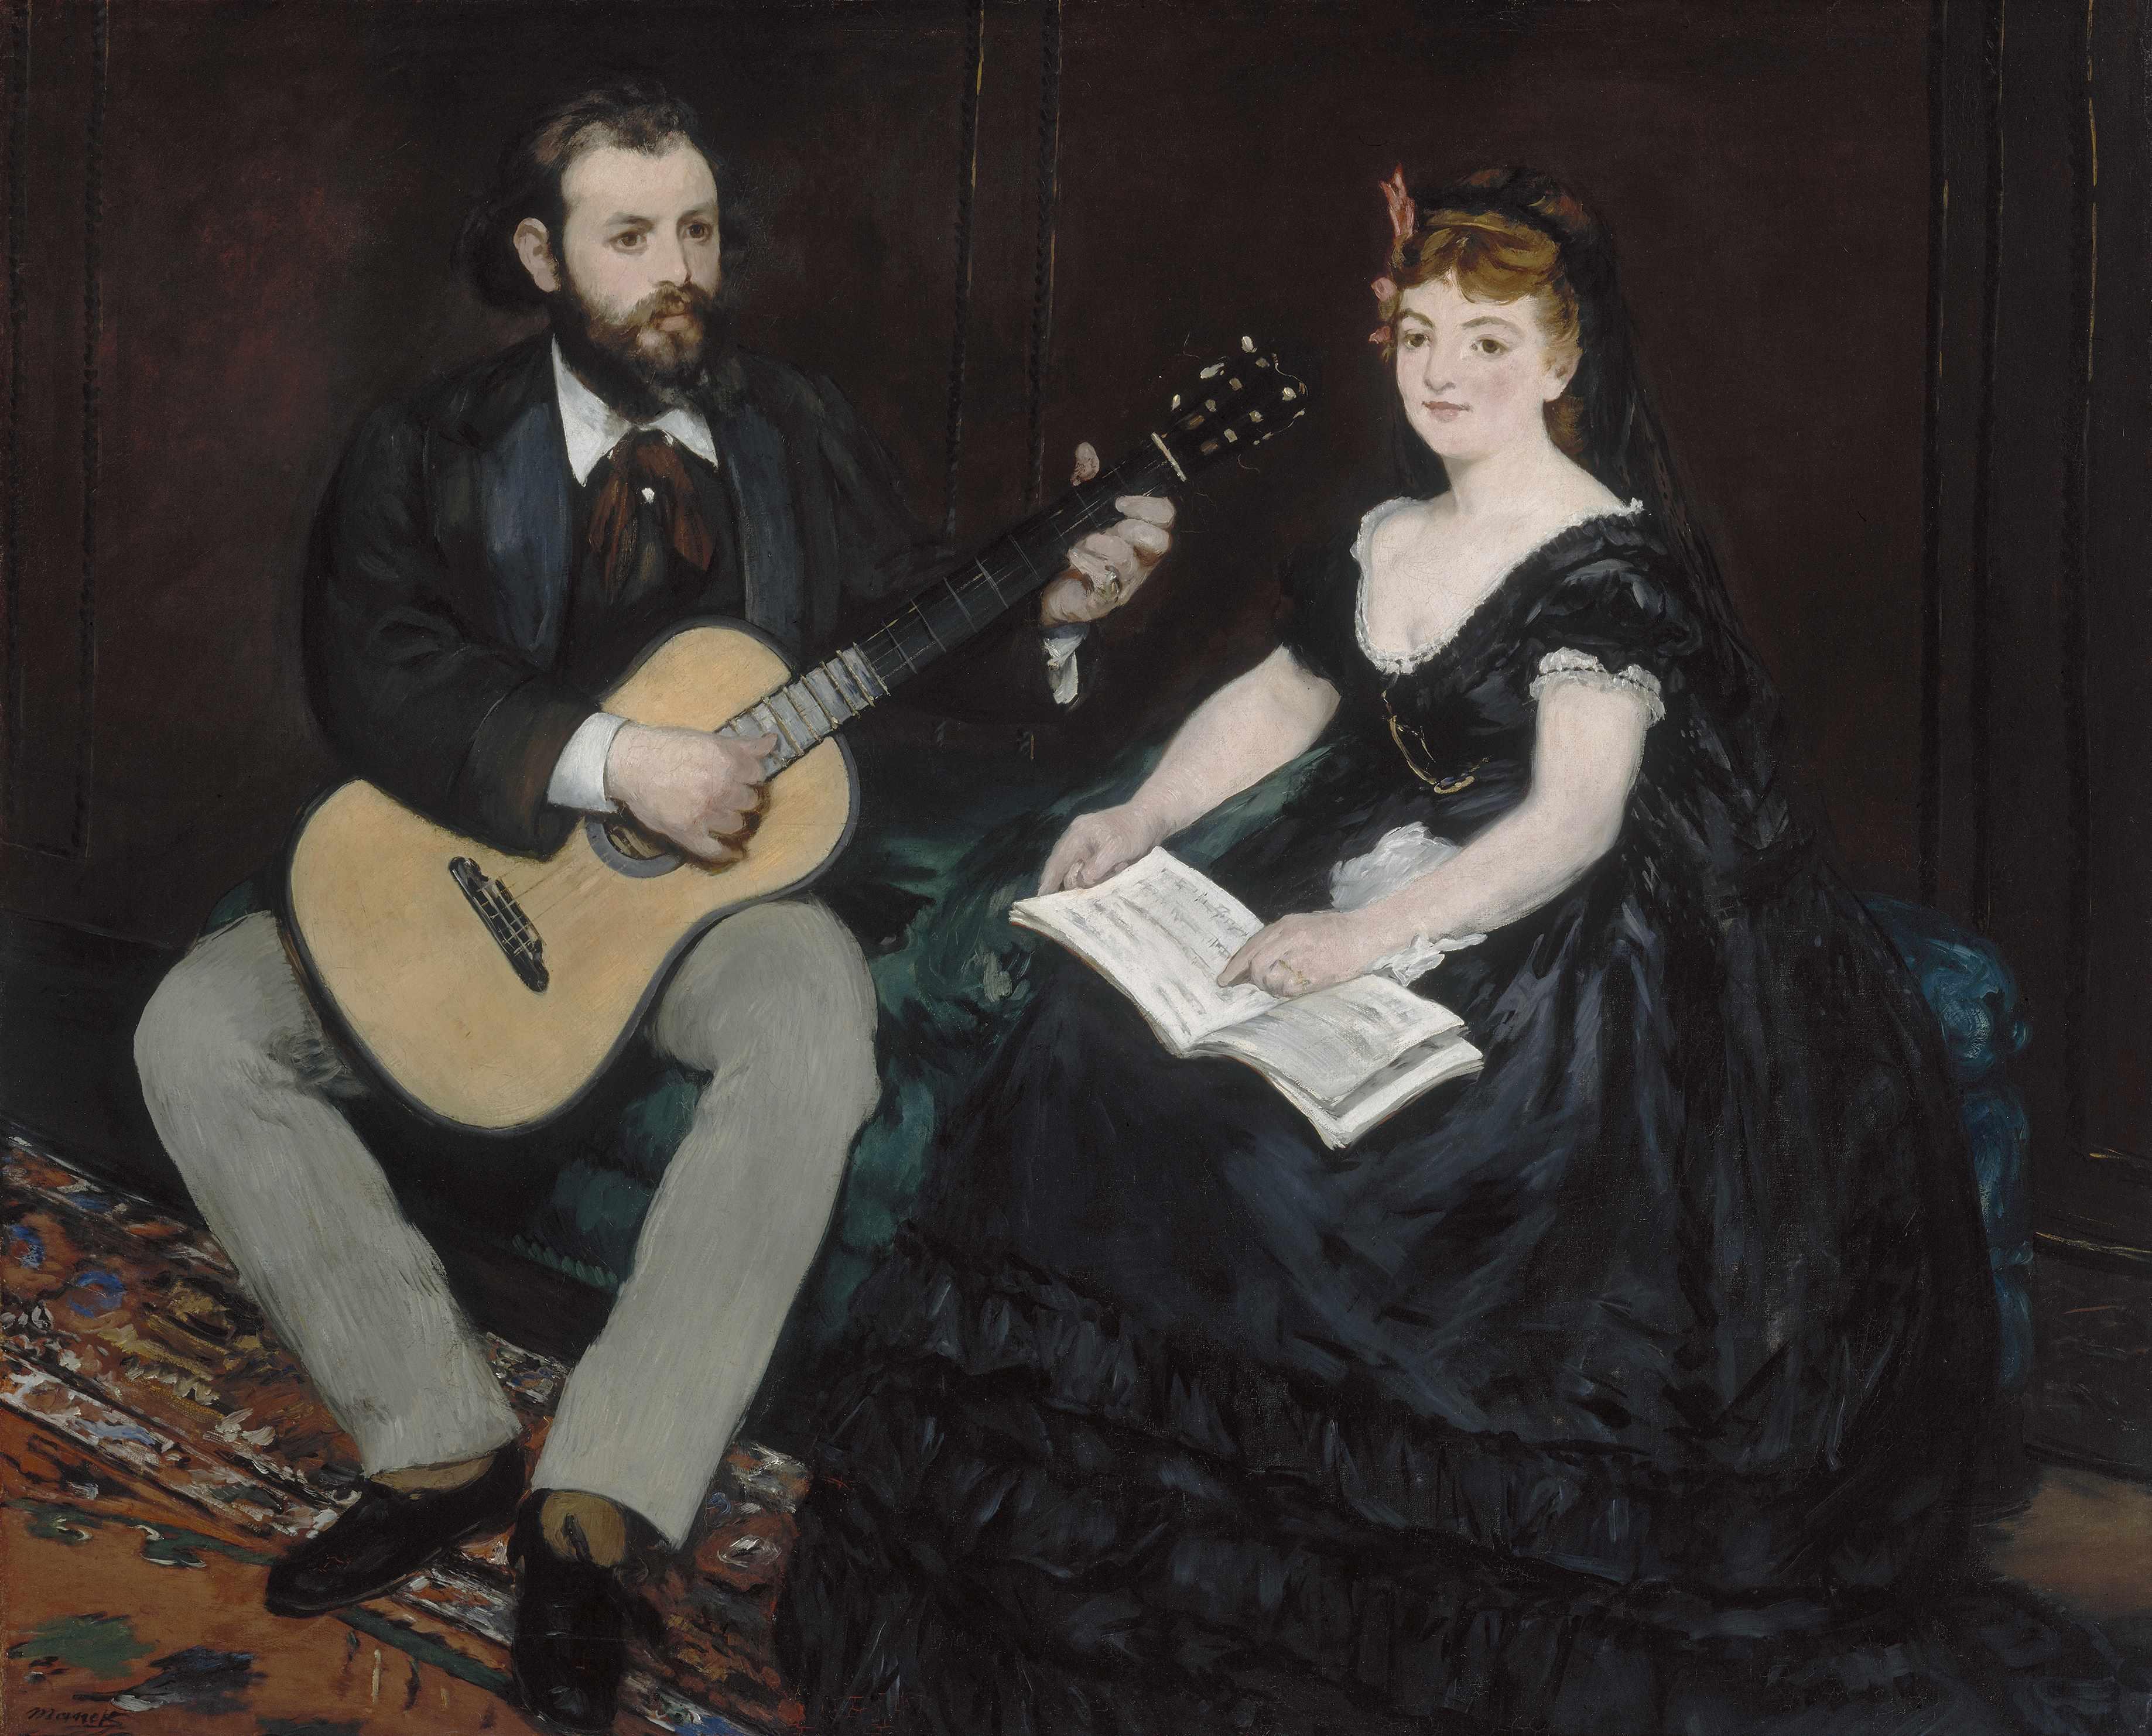 Картинки по запросу representation de la musique dans l art